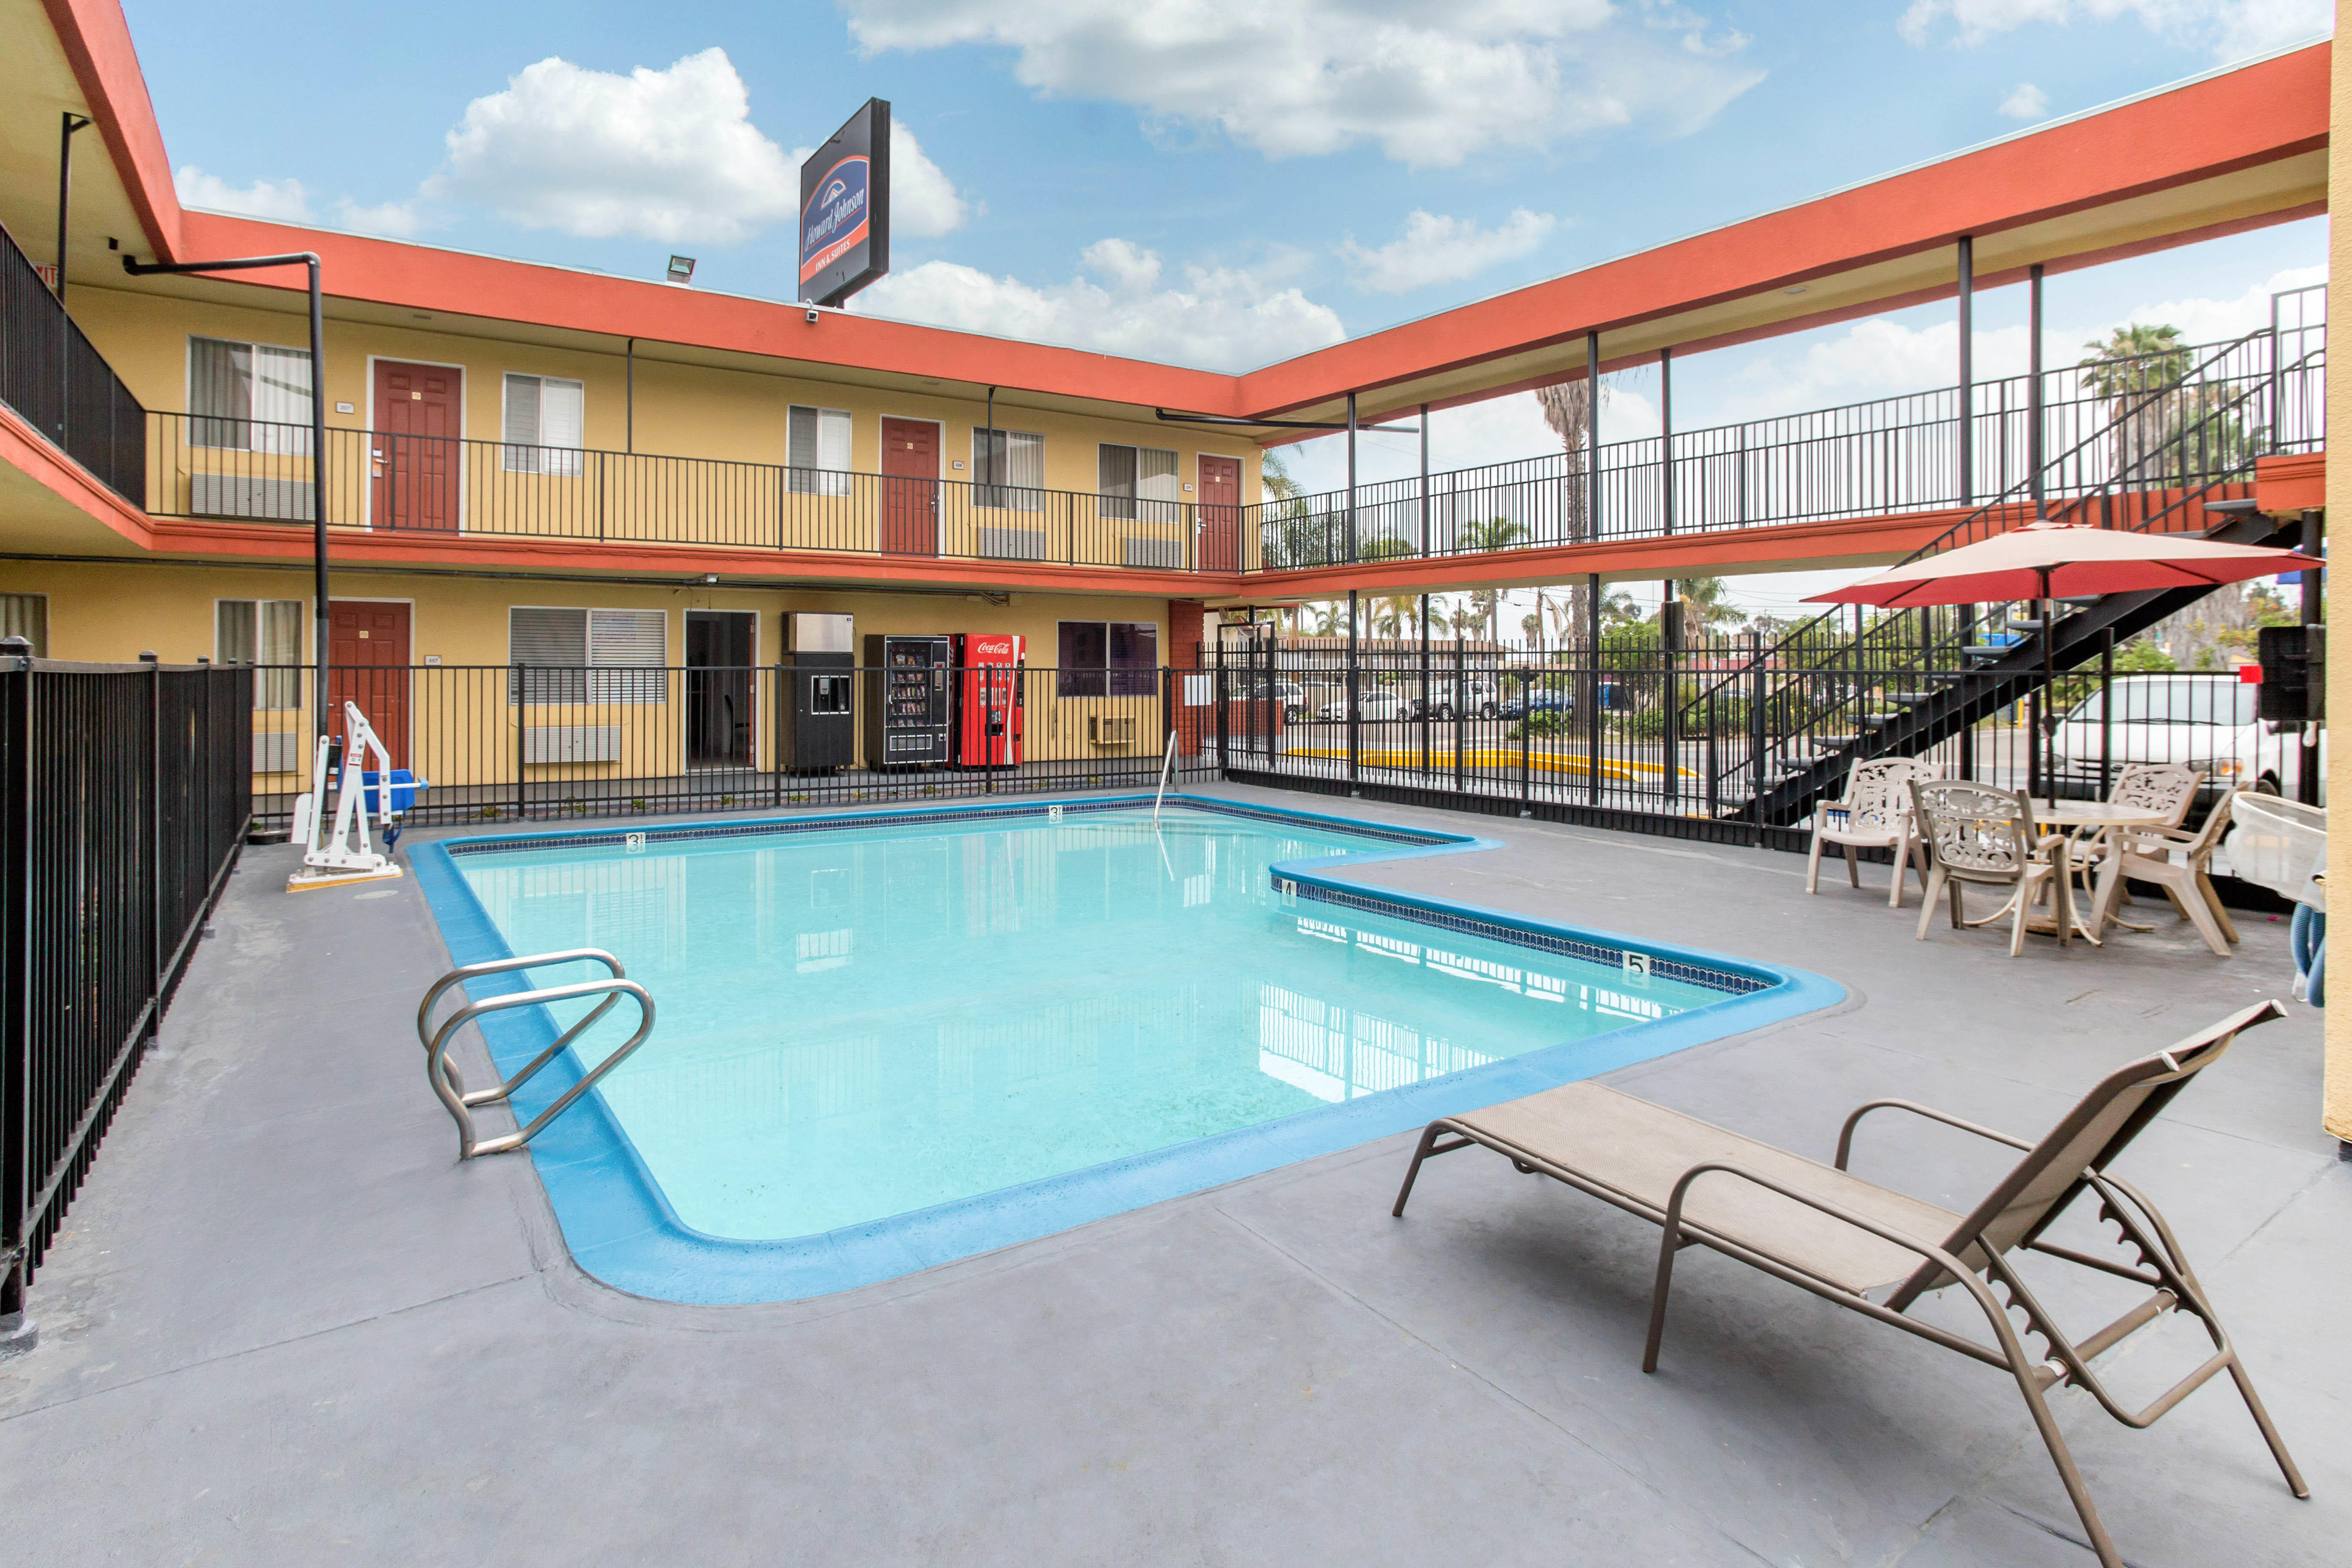 Howard Johnson by Wyndham Chula Vista San Diego Suite Hotel image 12